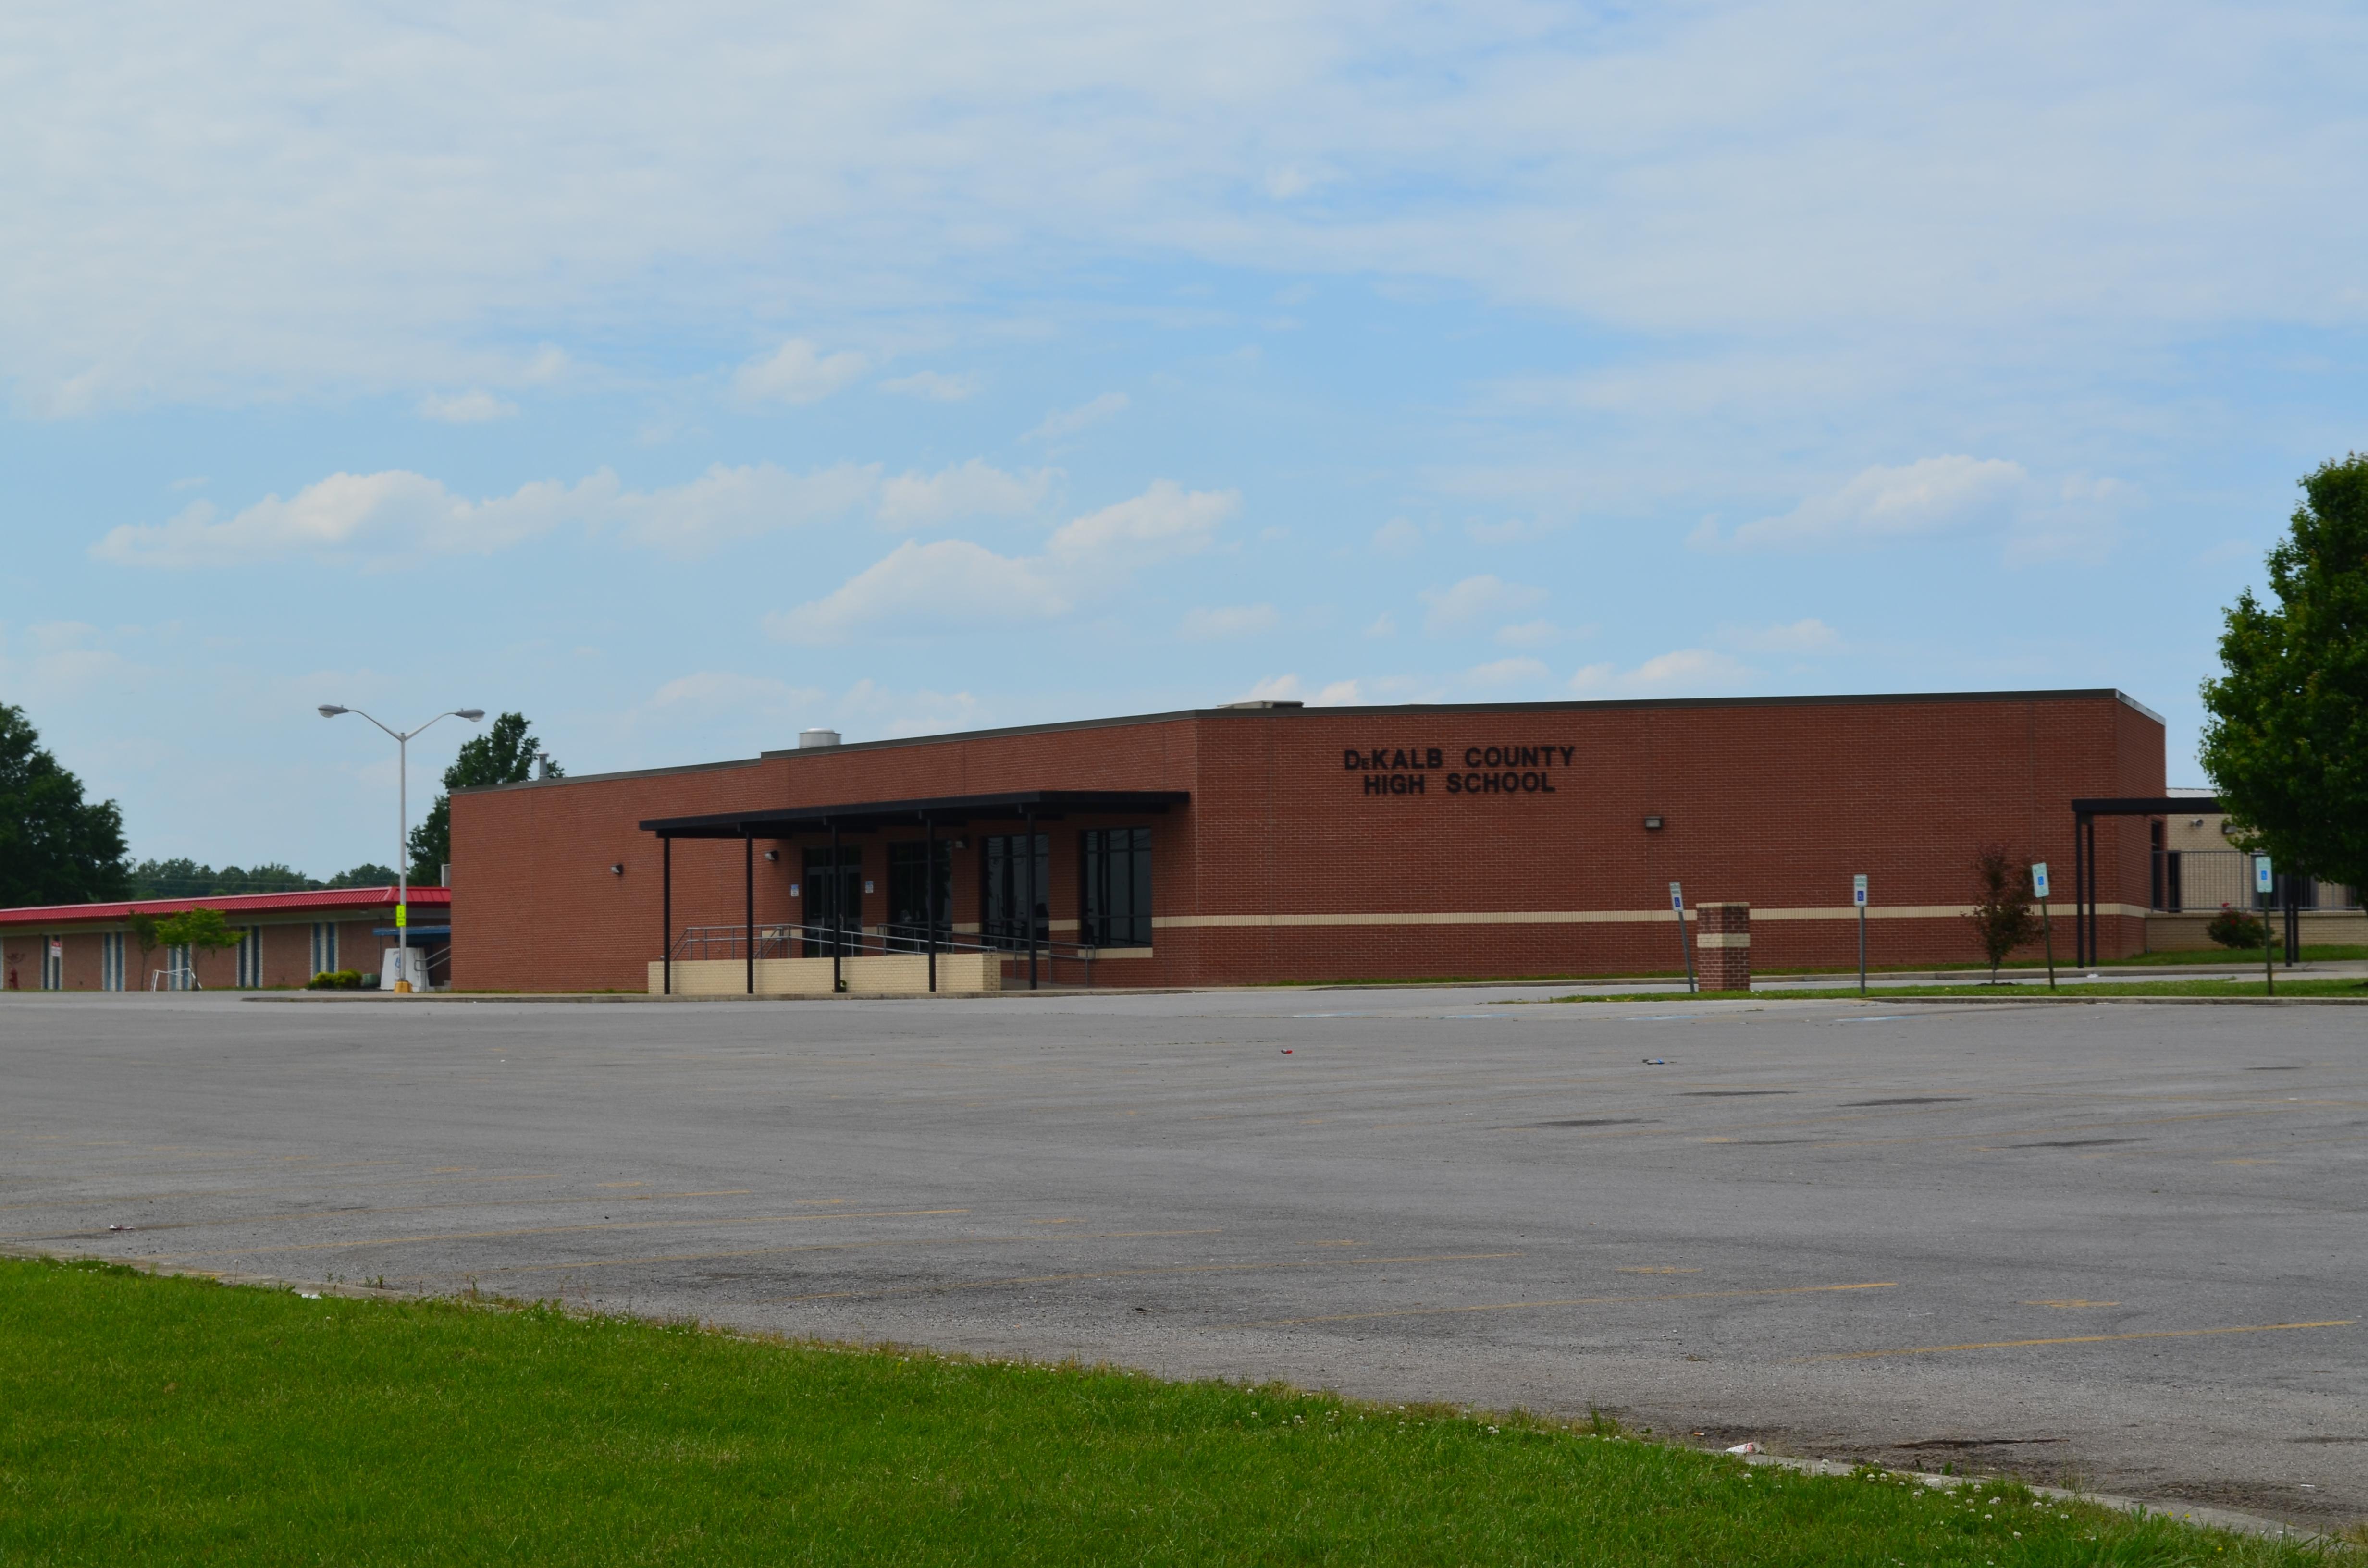 dekalb county school district pats - HD1200×795